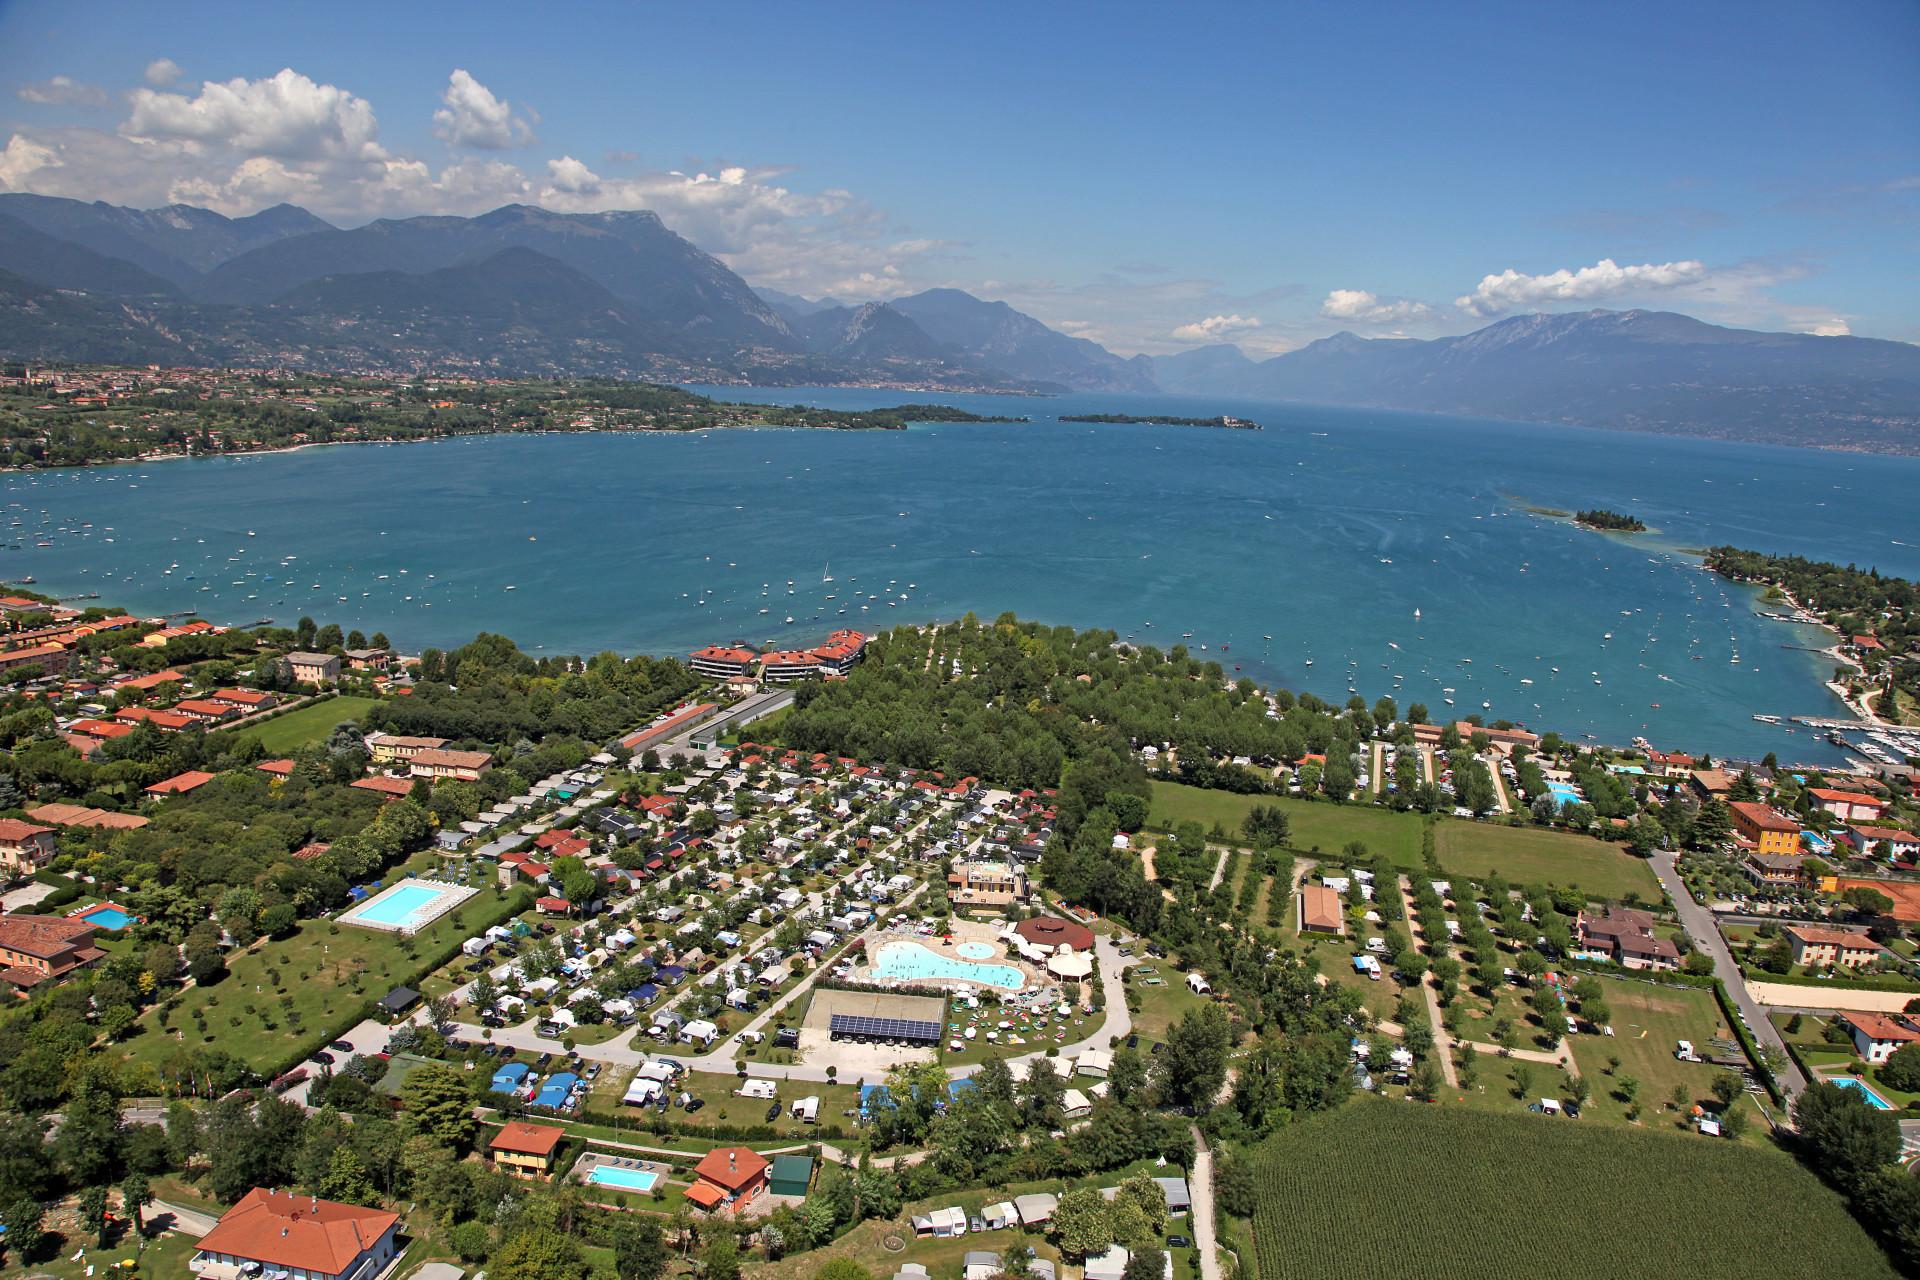 Přidán camping Baia Verde u Lago di Garda